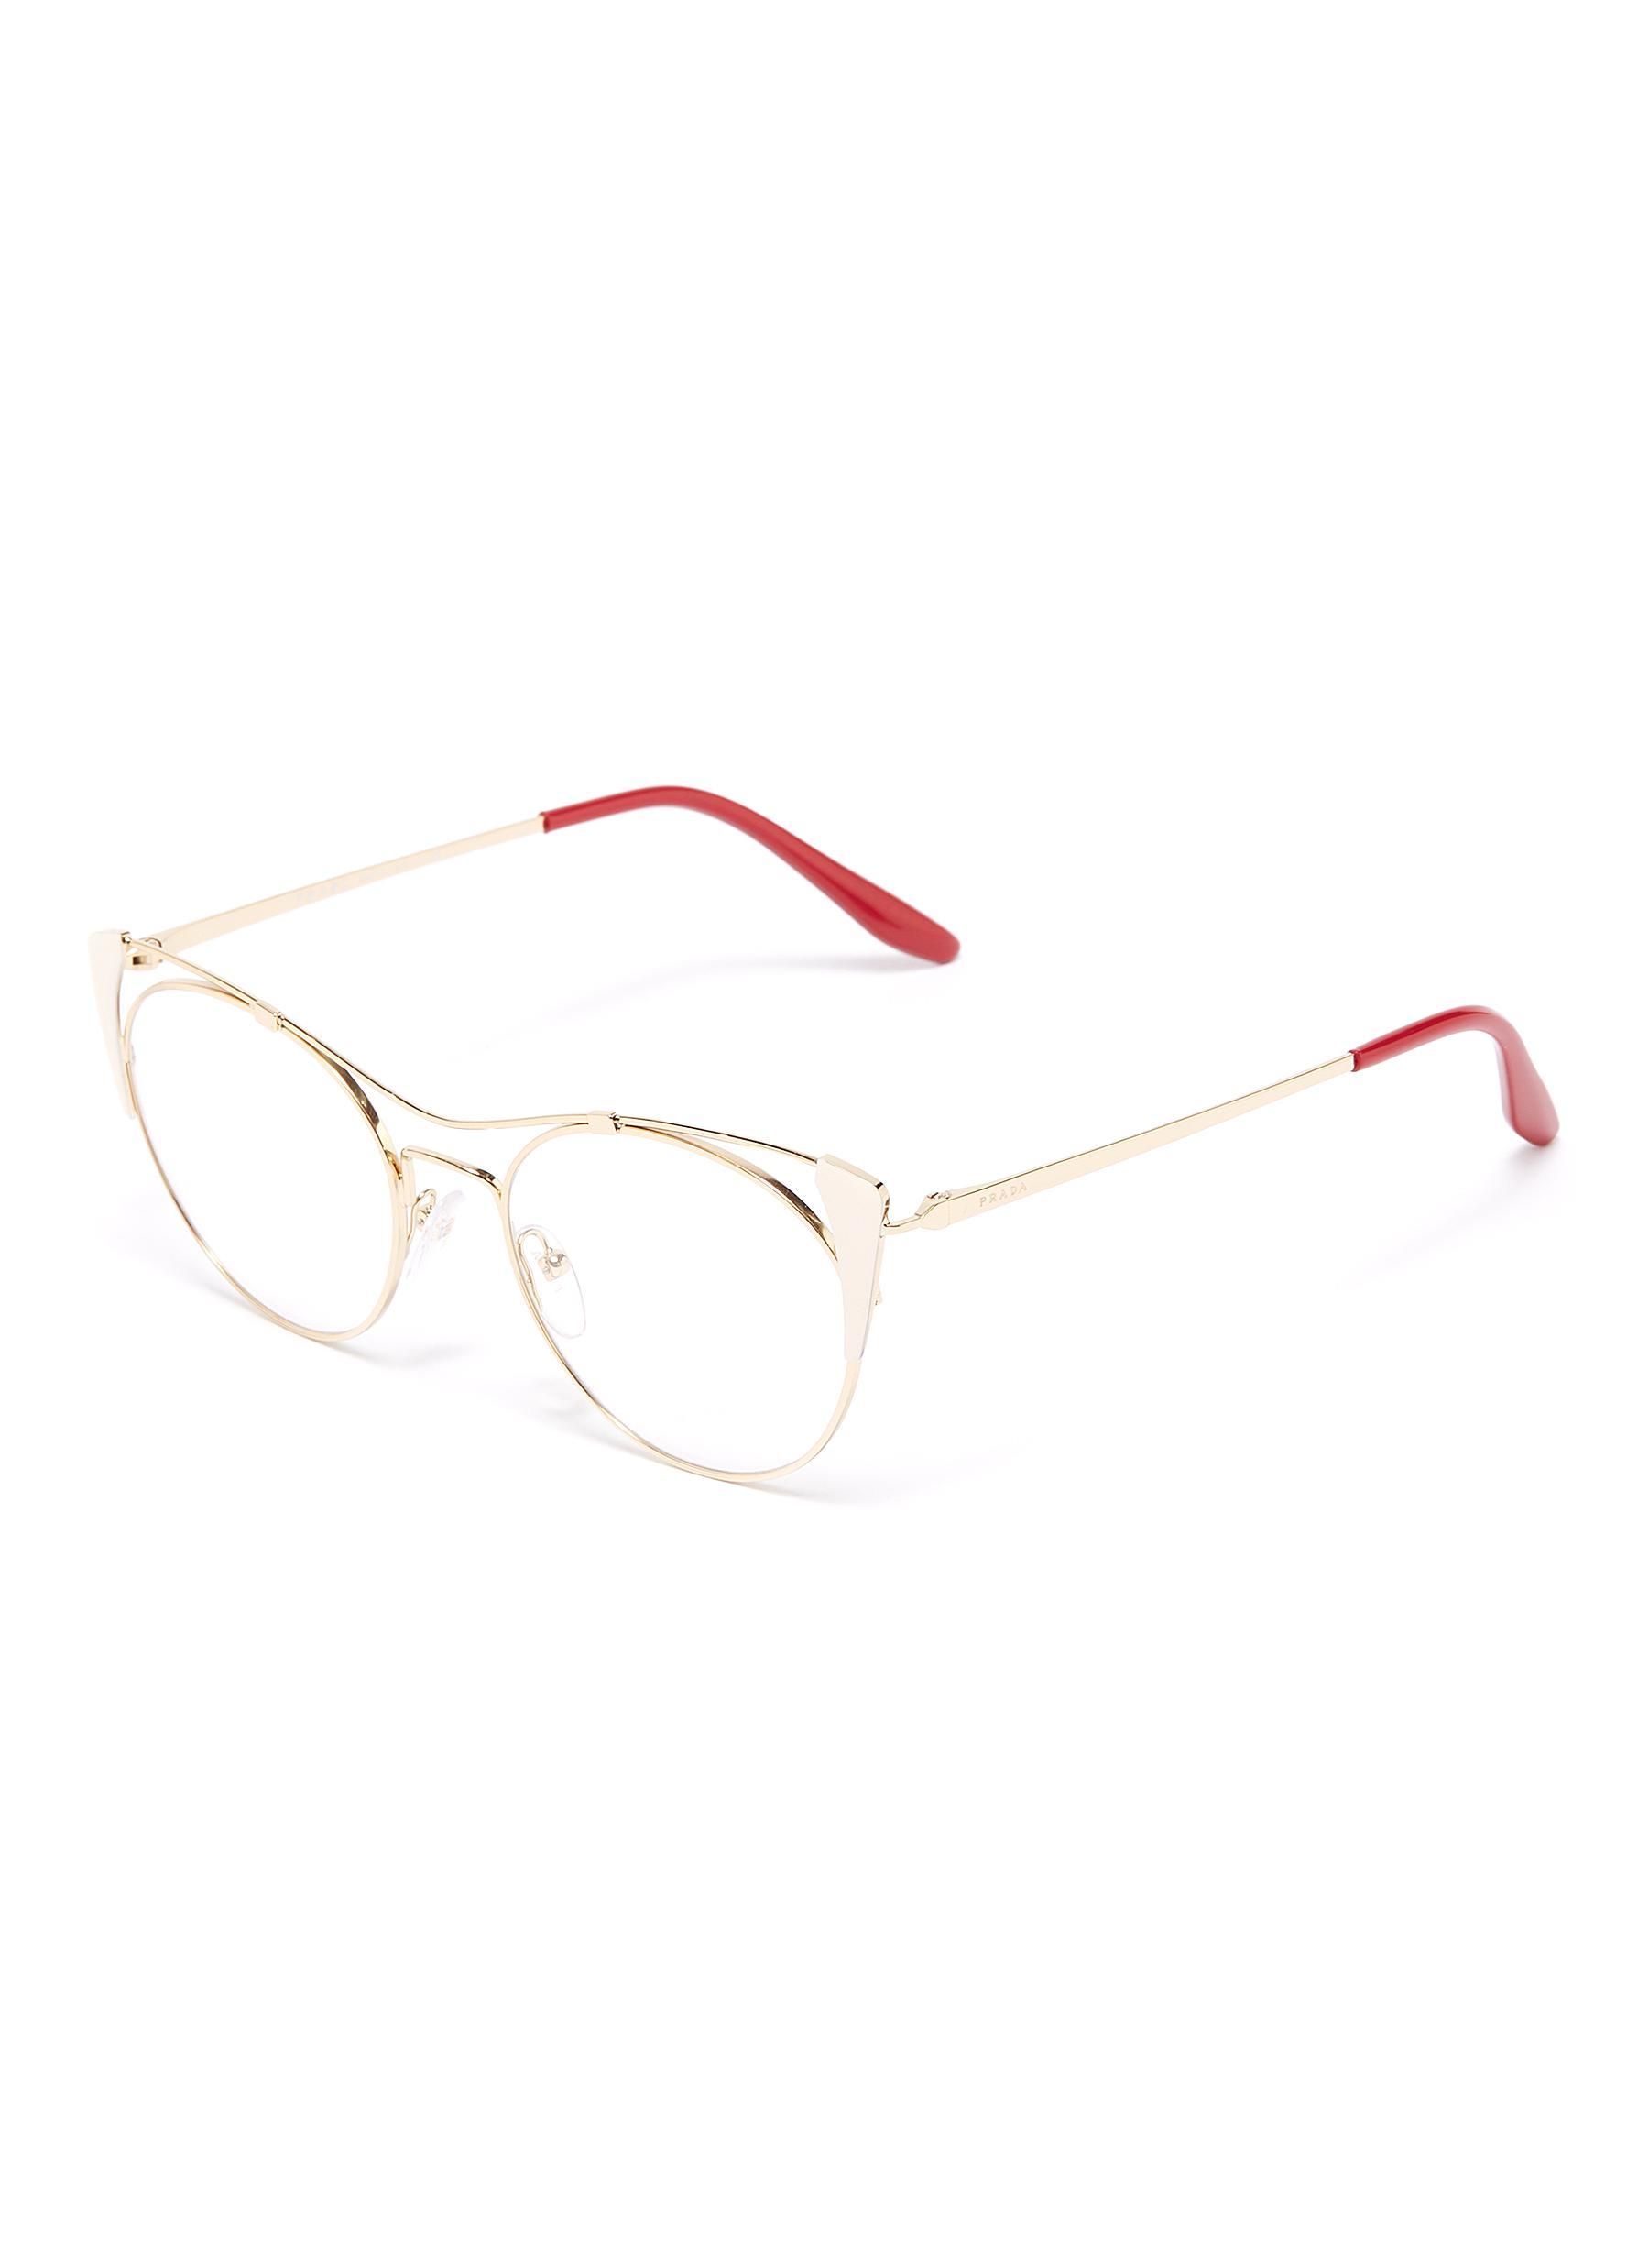 56b07cf5e9e97 Main View - Click To Enlarge - Prada - Cutout metal cat eye optical glasses